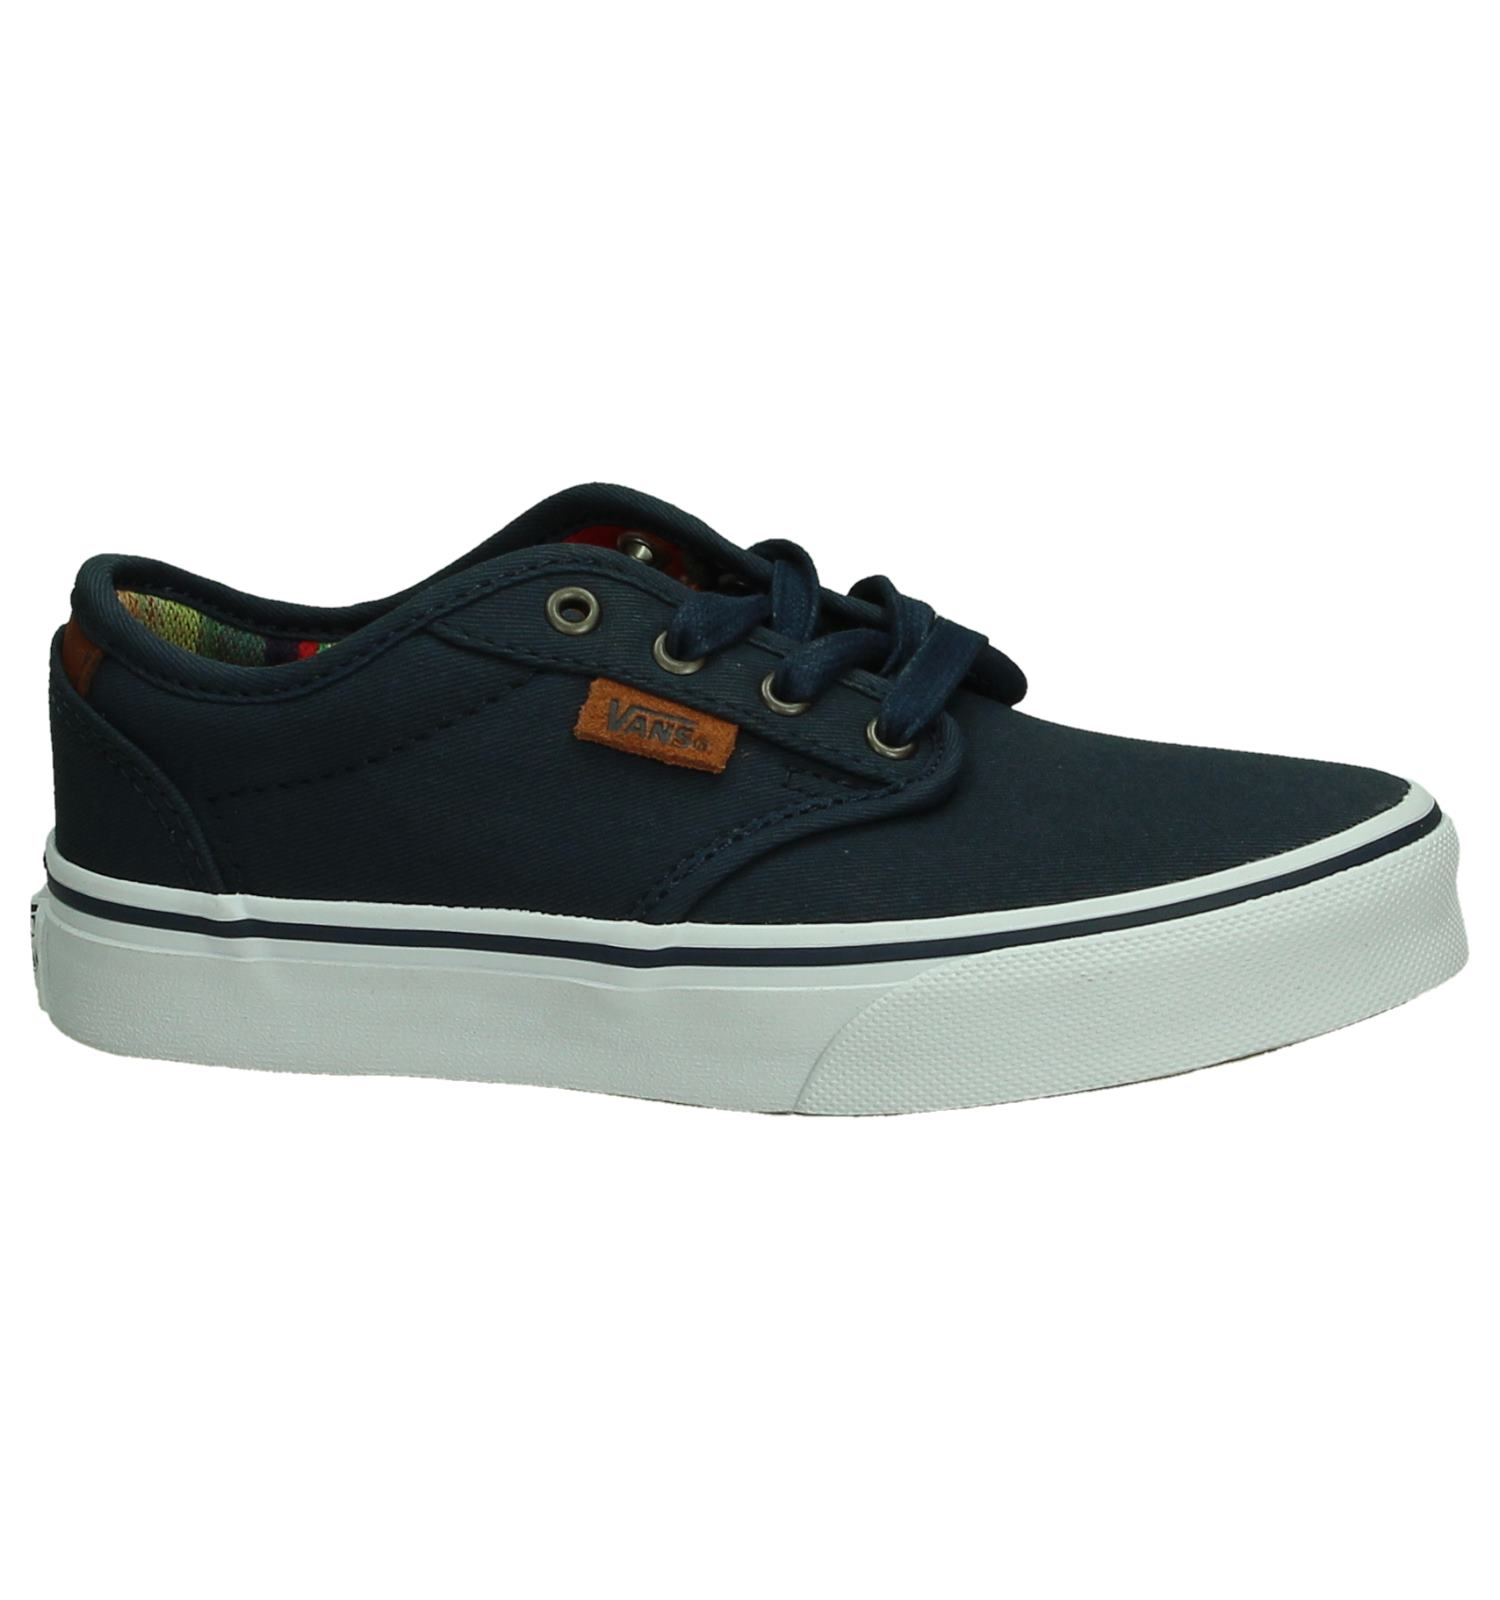 9fbec5ddfb4 Blauwe Sneakers Vans Atwood DX   TORFS.BE   Gratis verzend en retour